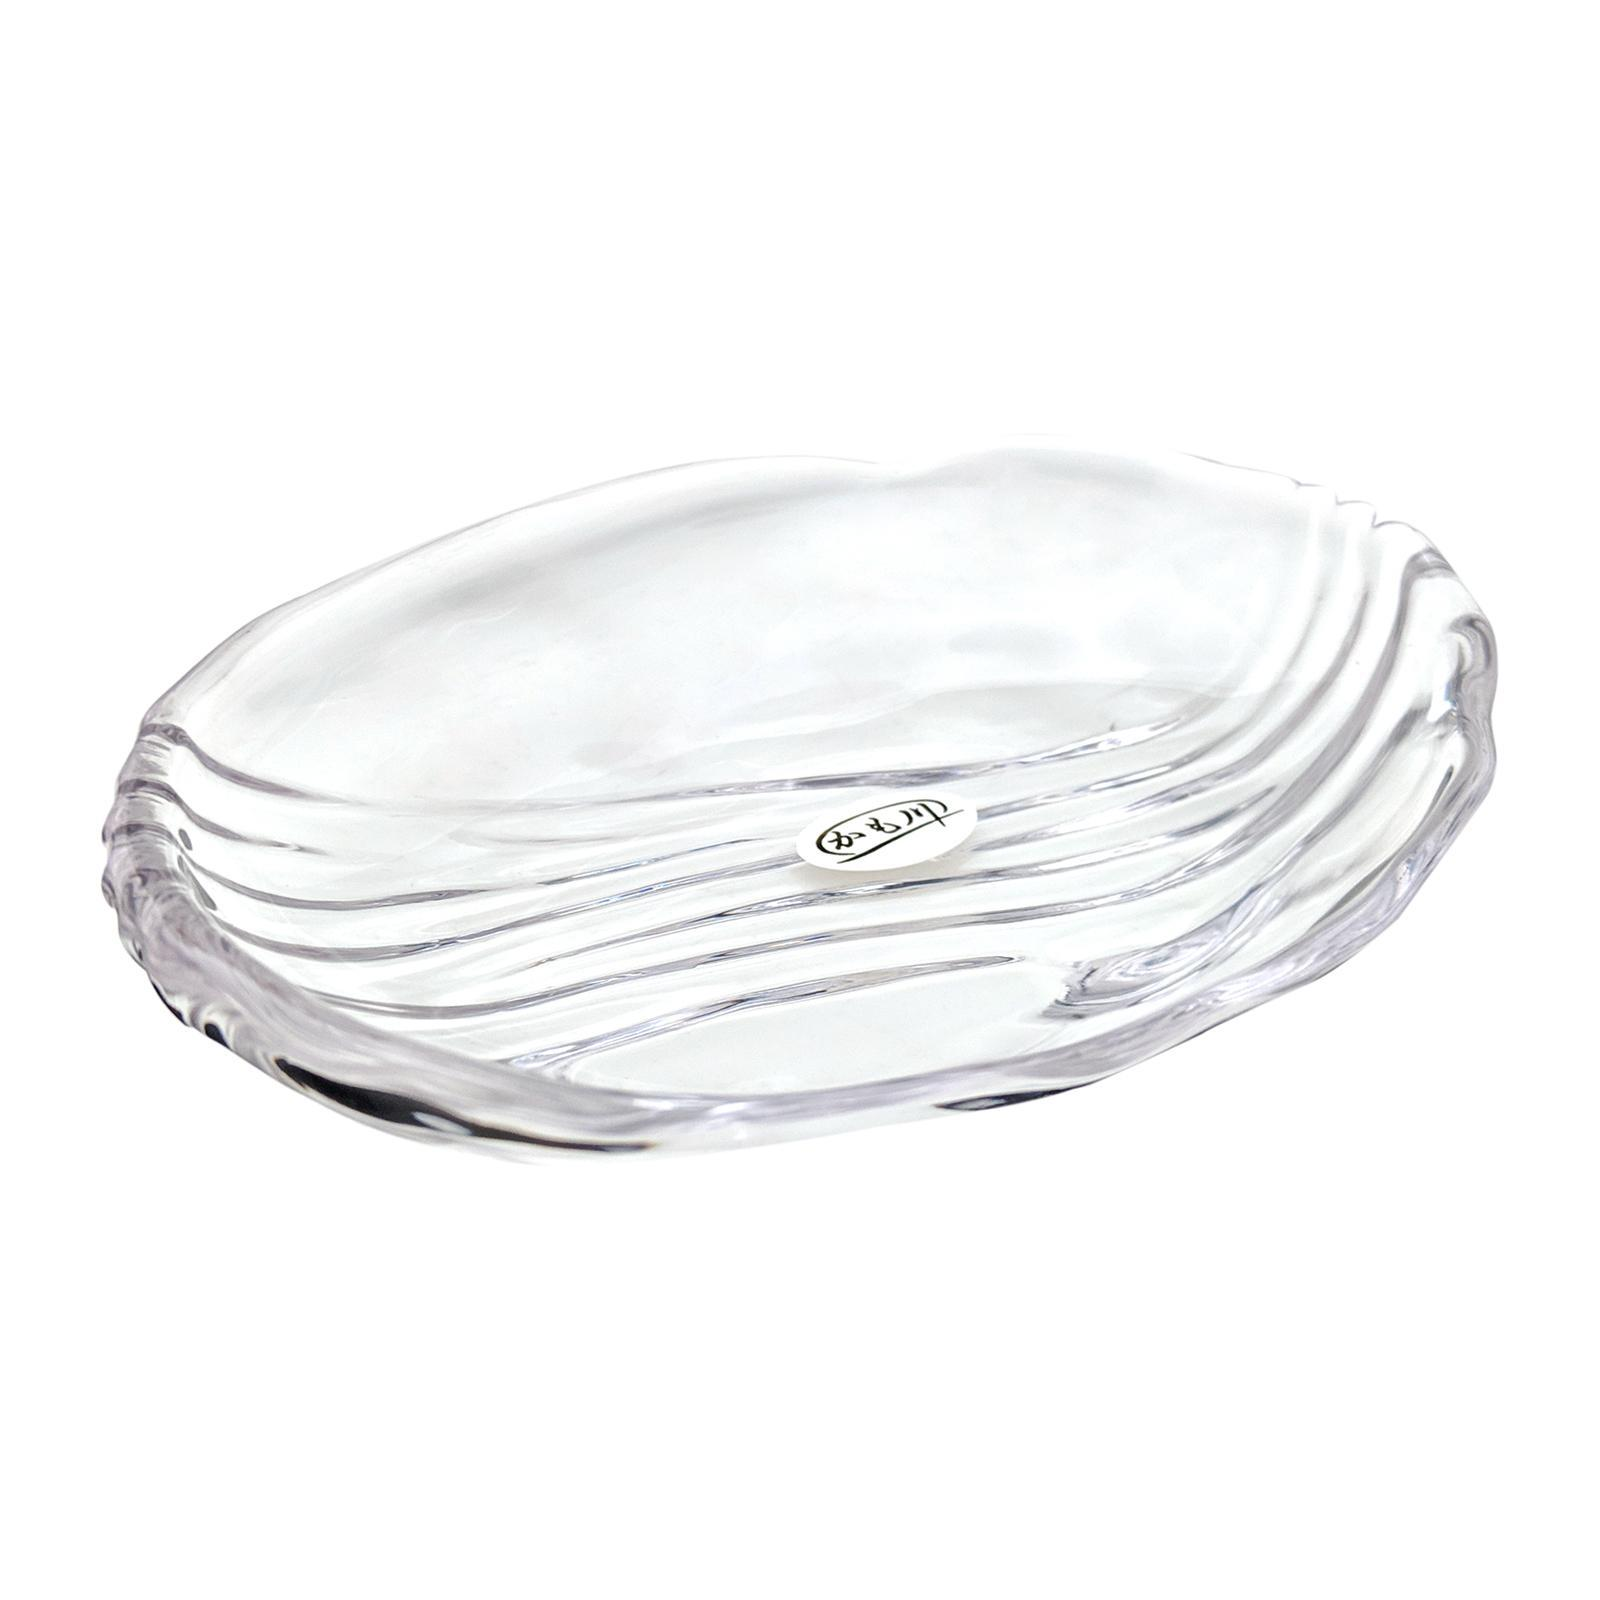 Soga KMGW Oval Glass Dish 14 CM 3-PCS Set